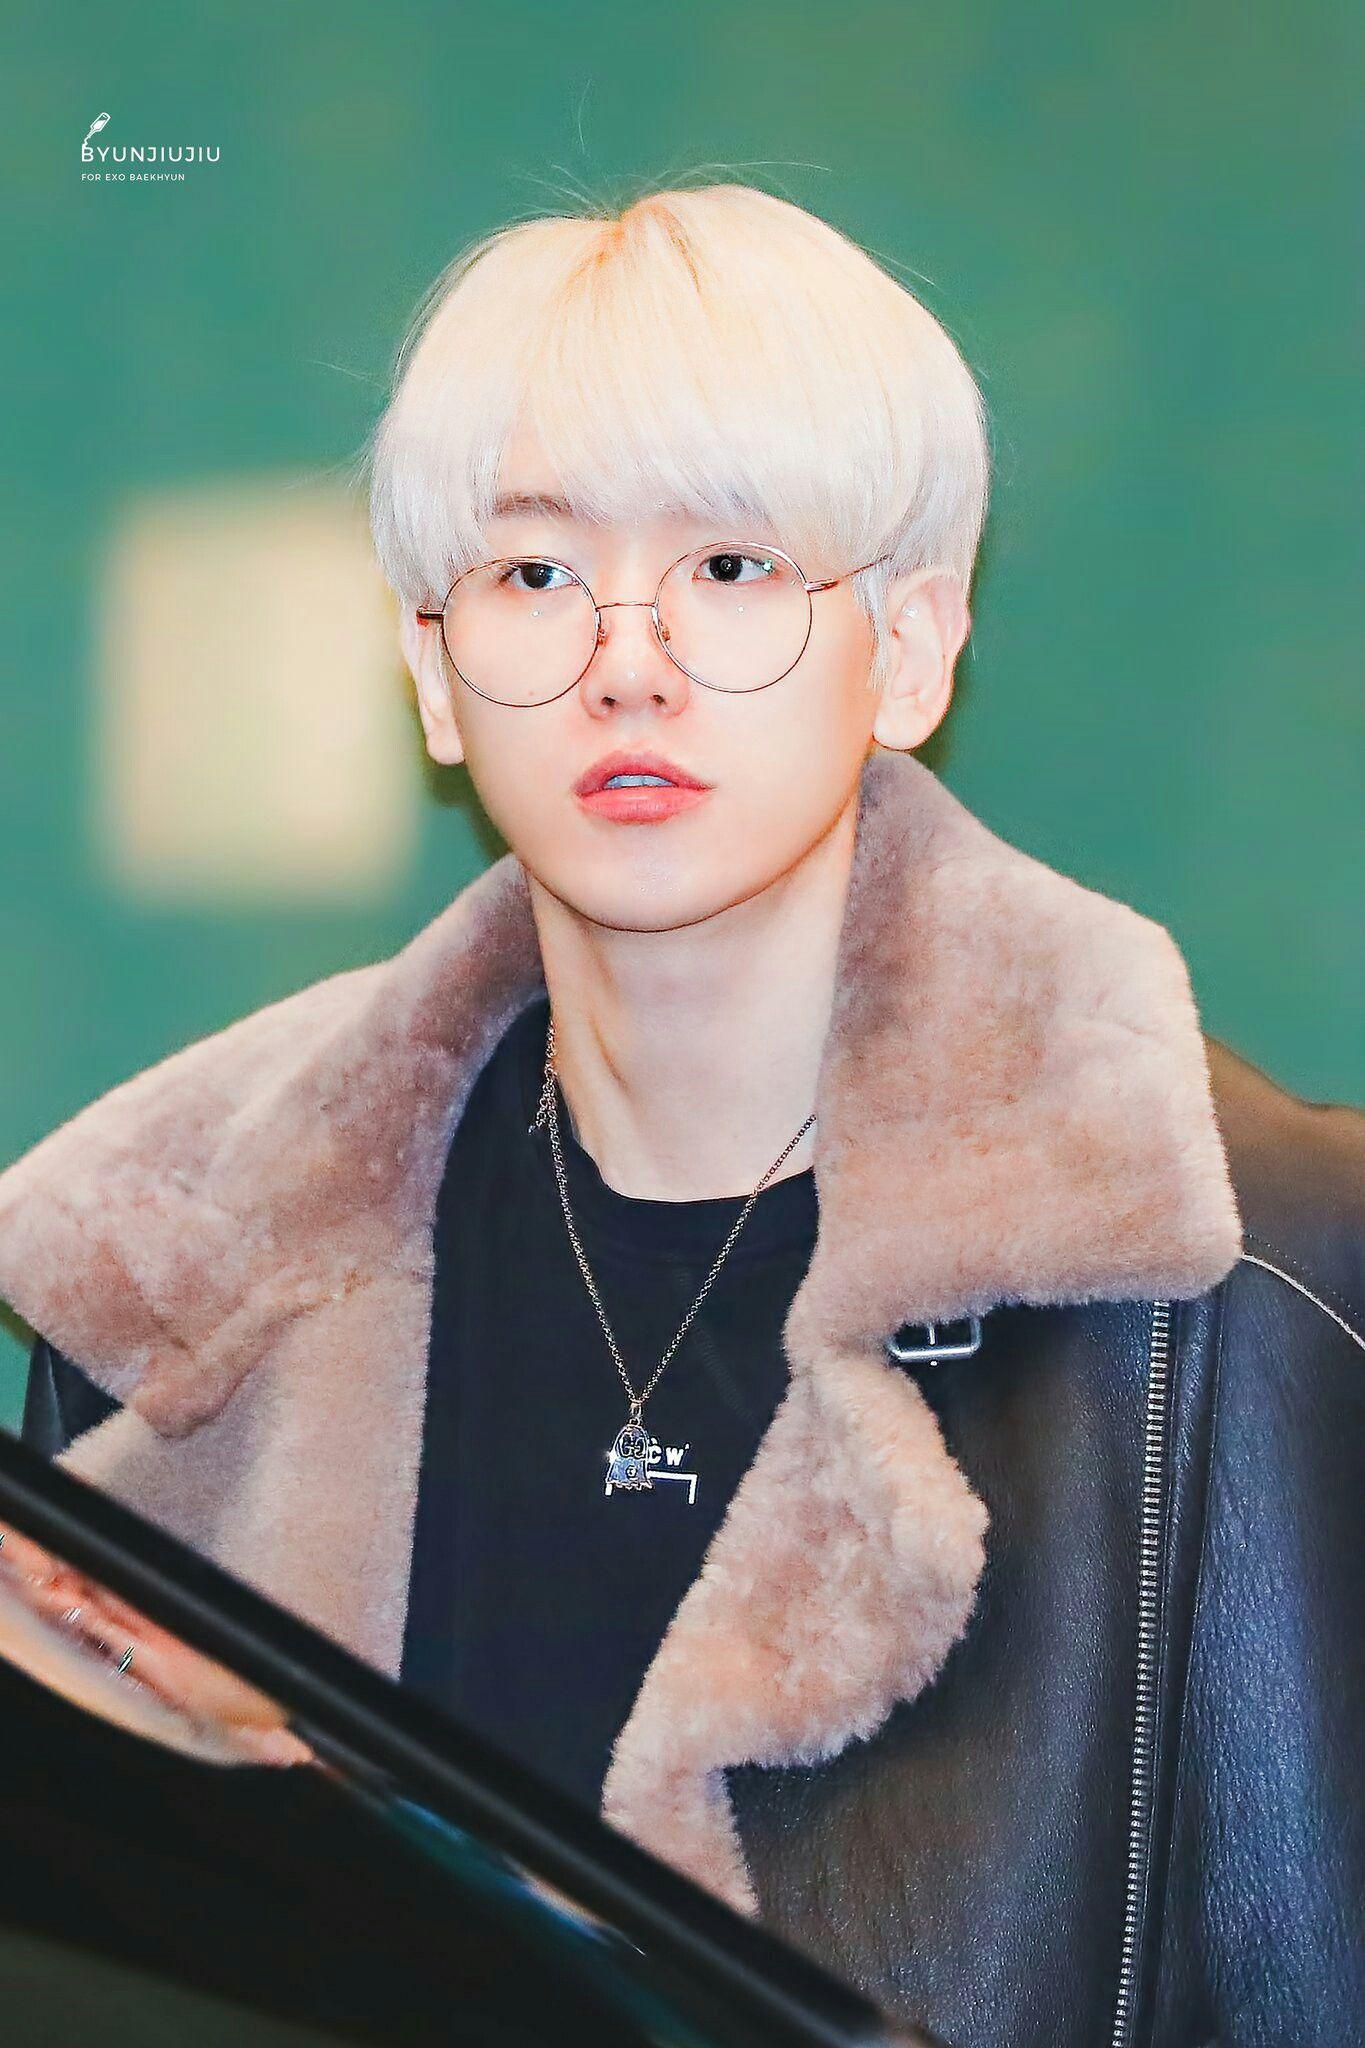 Byunbaekhyun Baekhyunee Baekhyun Exo Cute Baby Angel